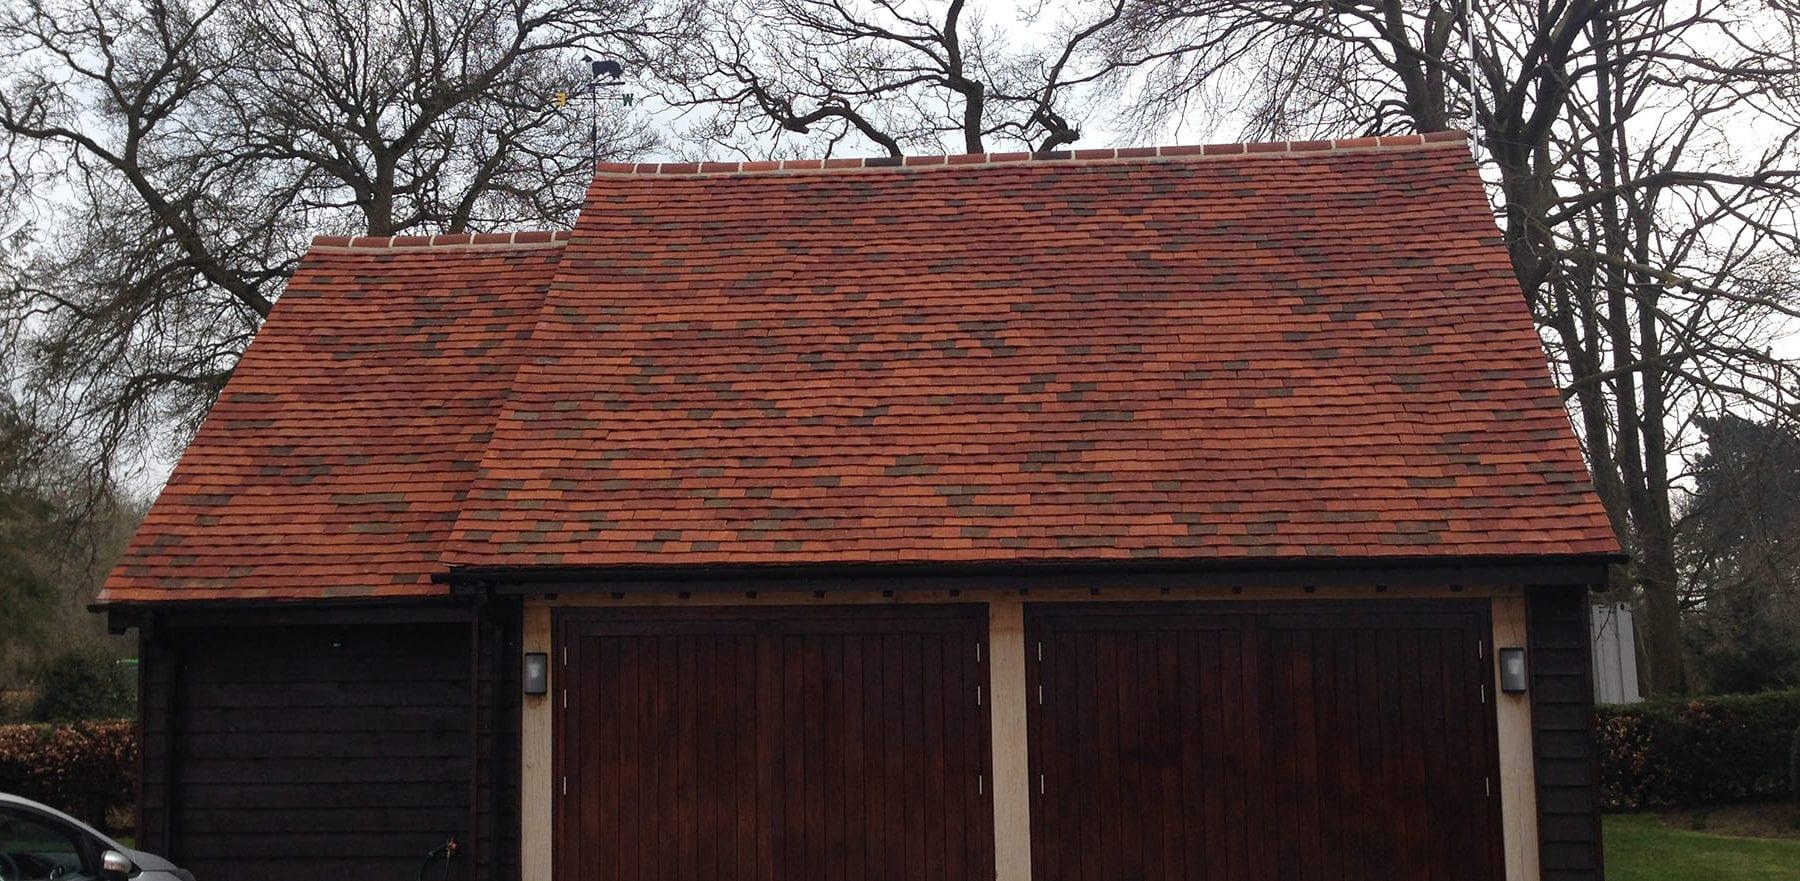 Lifestiles - Handmade Multi Clay Roof Tiles - Takeley, England 6